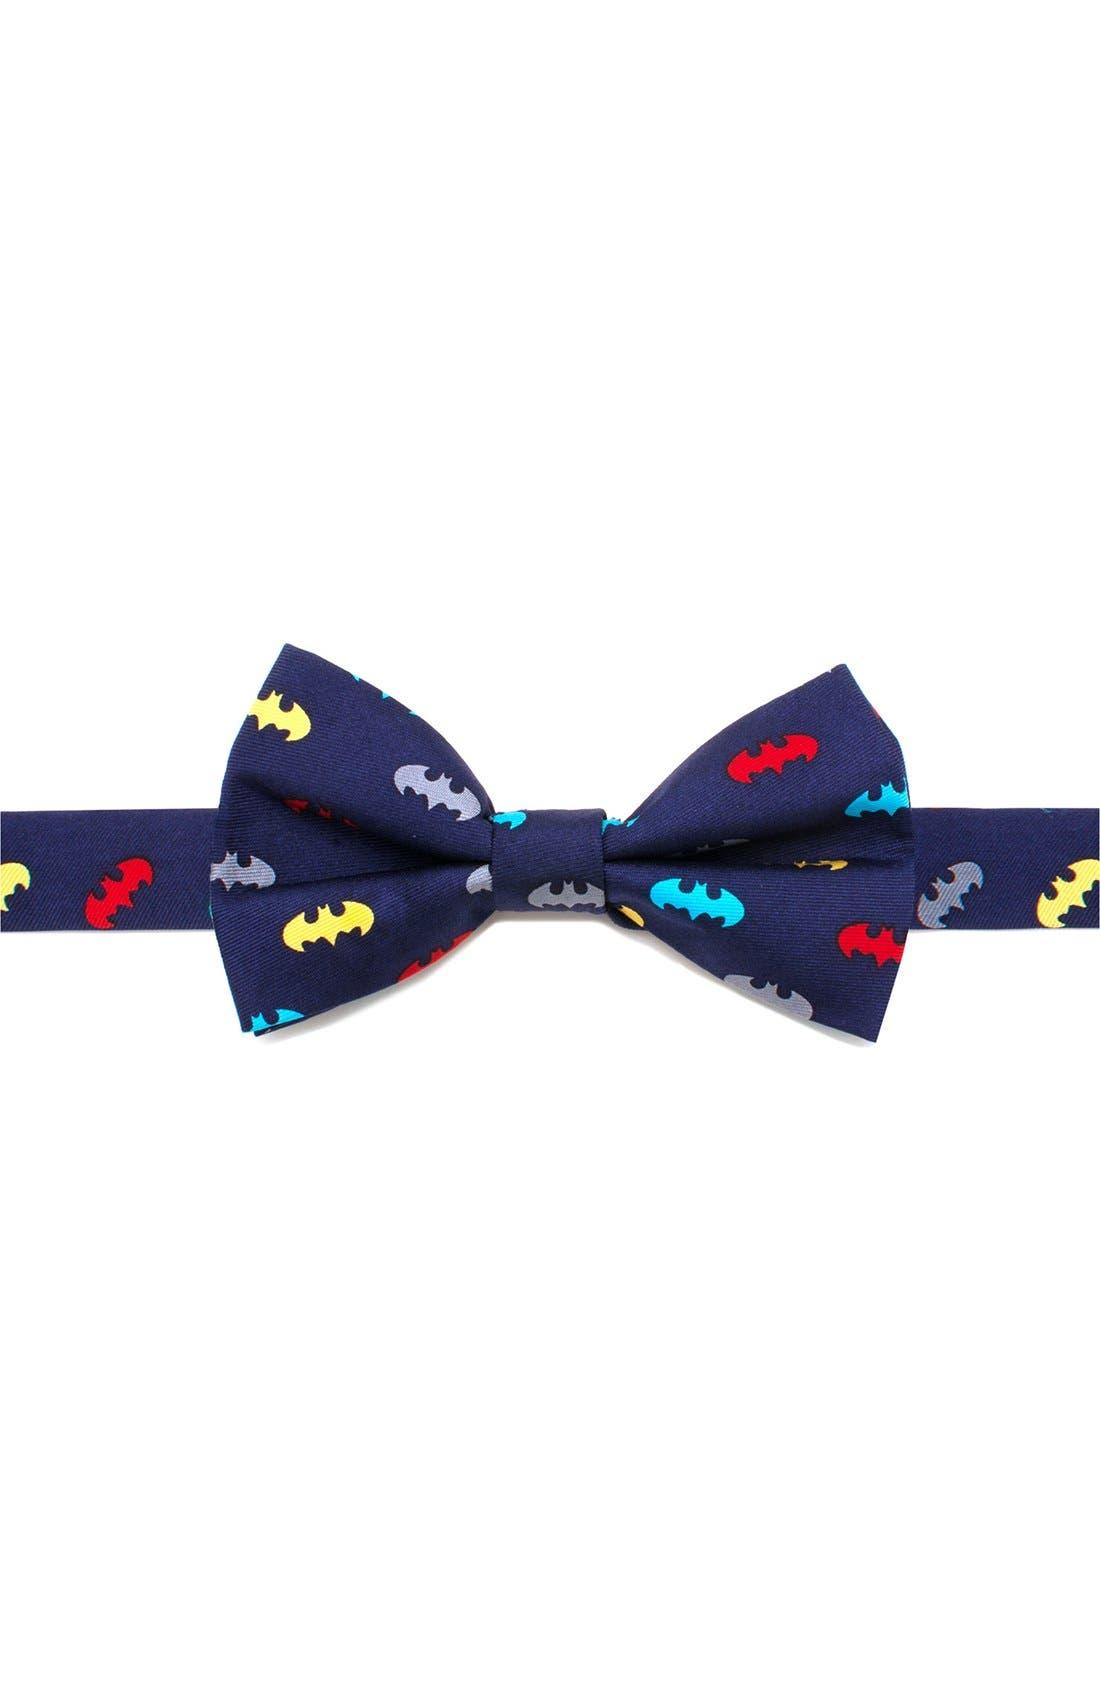 'Batman' Silk Bow Tie,                             Main thumbnail 1, color,                             960